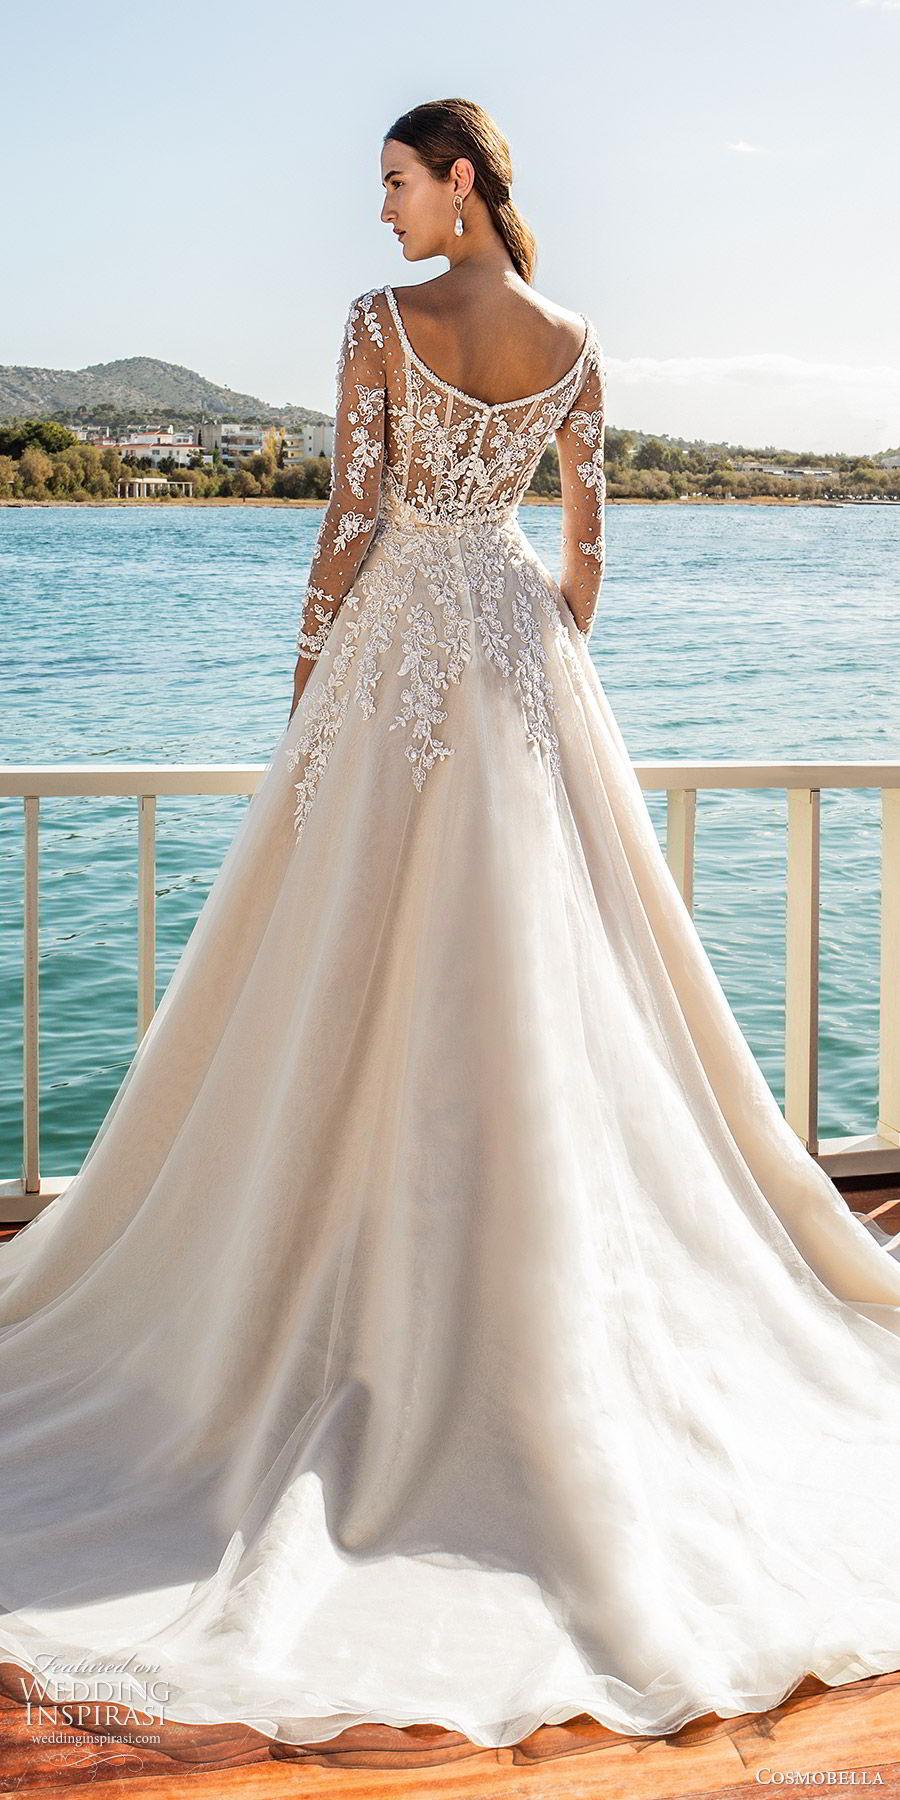 cosmobella 2020 bridal illusion long sleeves sweetheart embellished bodice a line ball gown wedding dress (21) elegant romantic princes chapel train bv